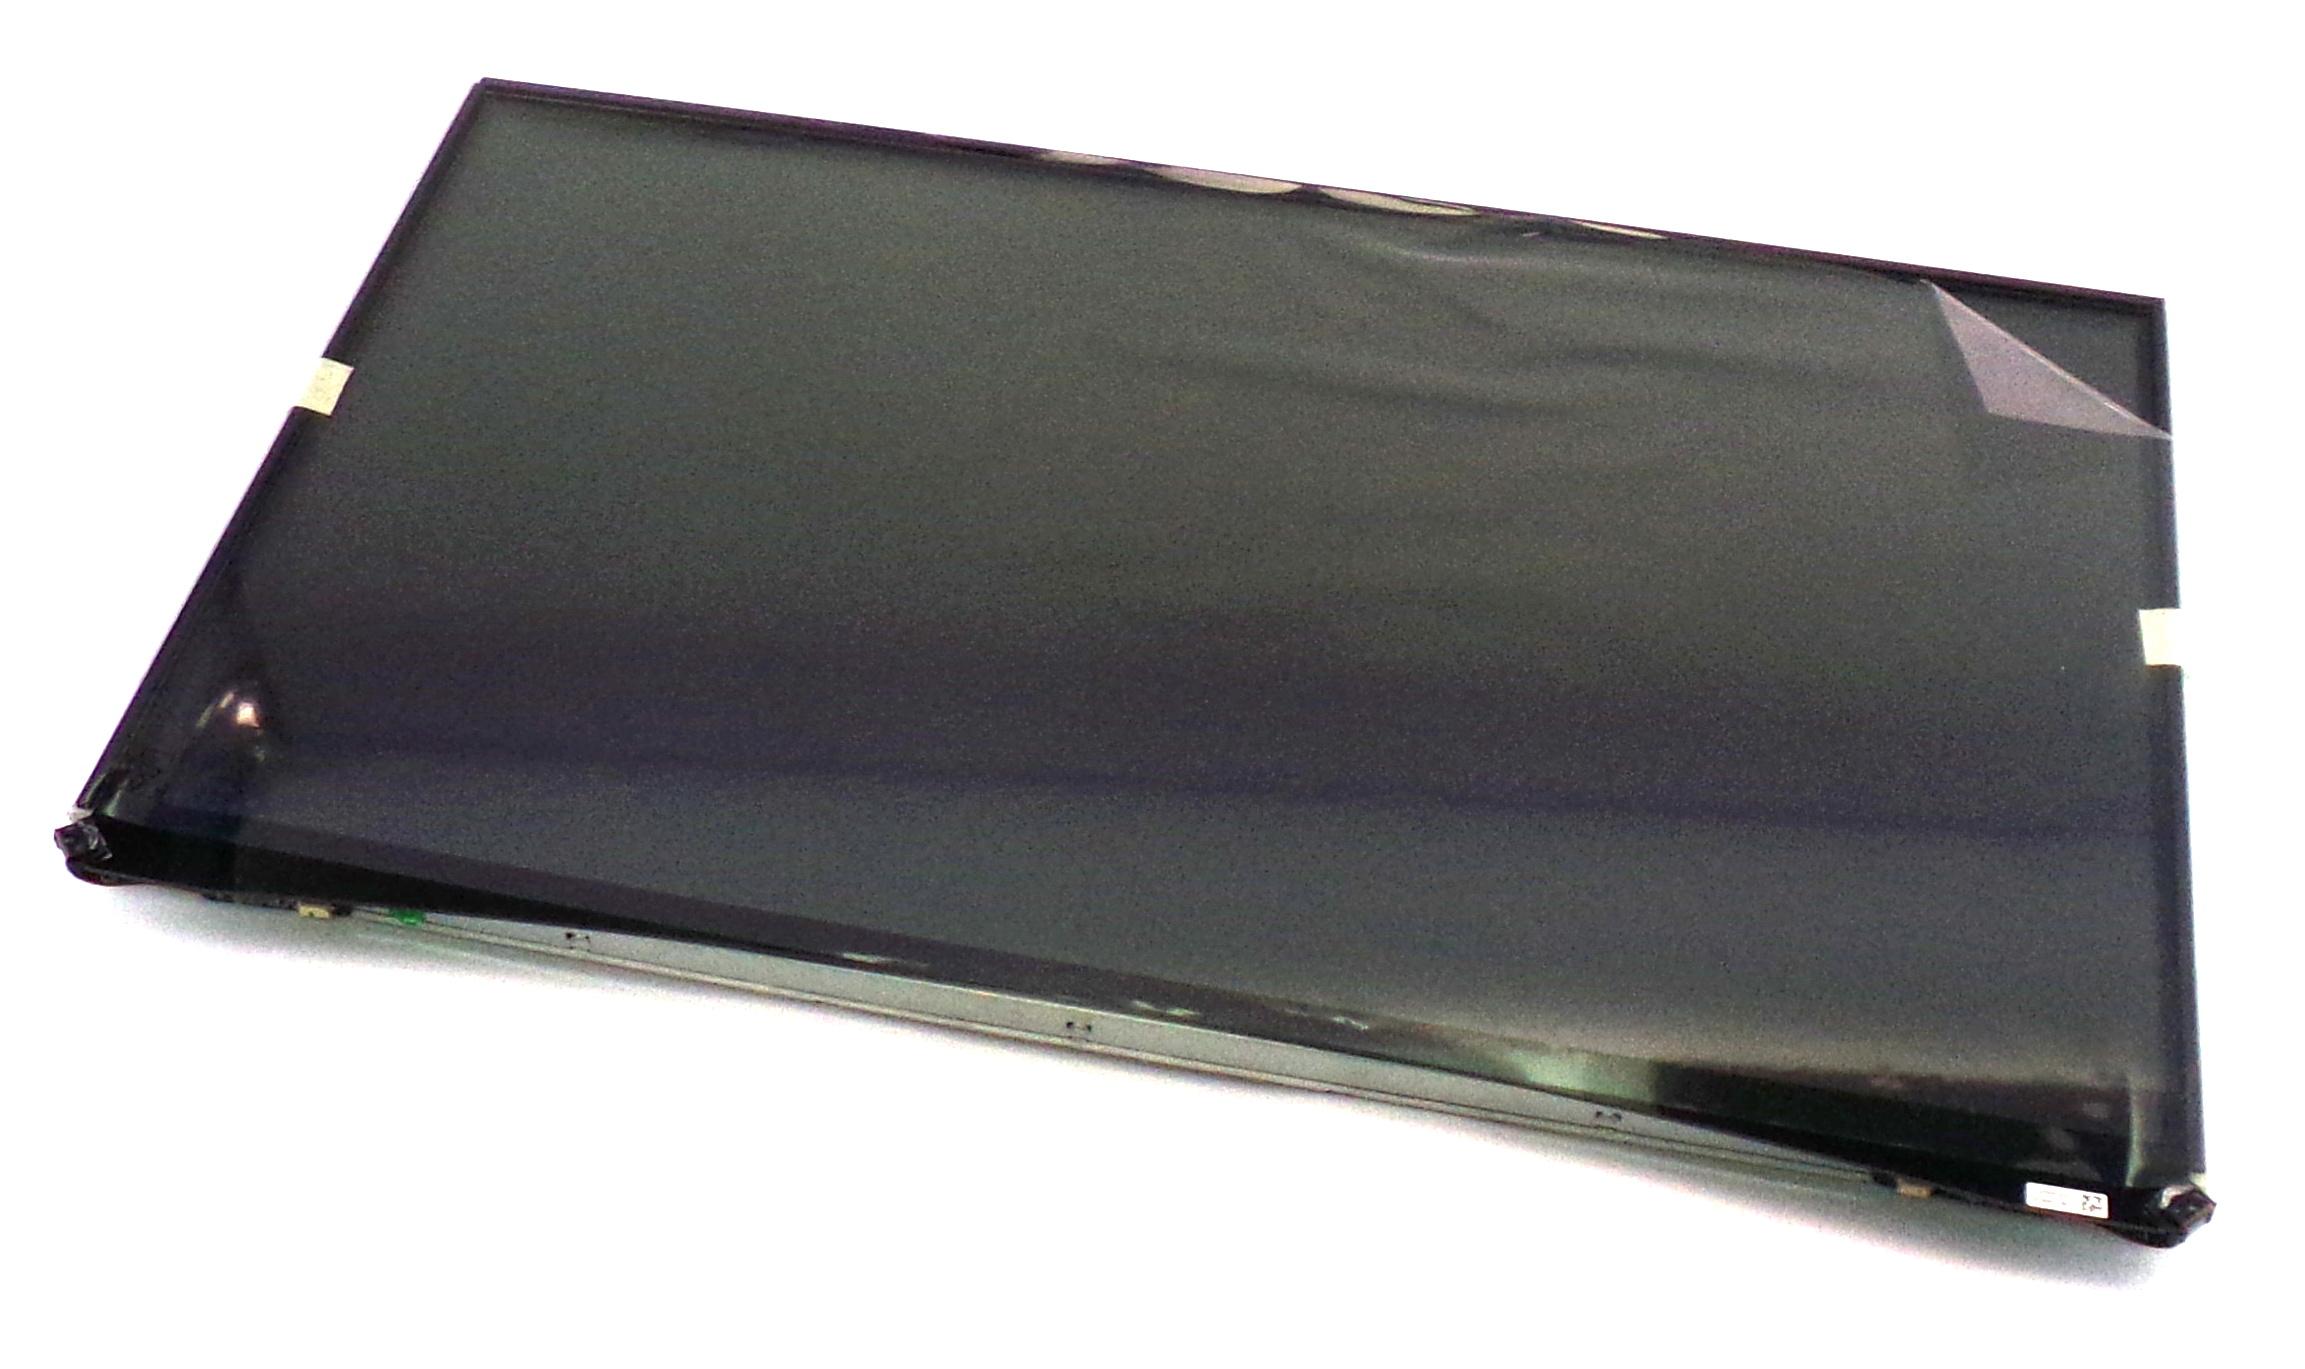 "New 6K.SCY07.002 Packard Bell LCD Panel 23"" Touch TQ1 W/CTRLBD"